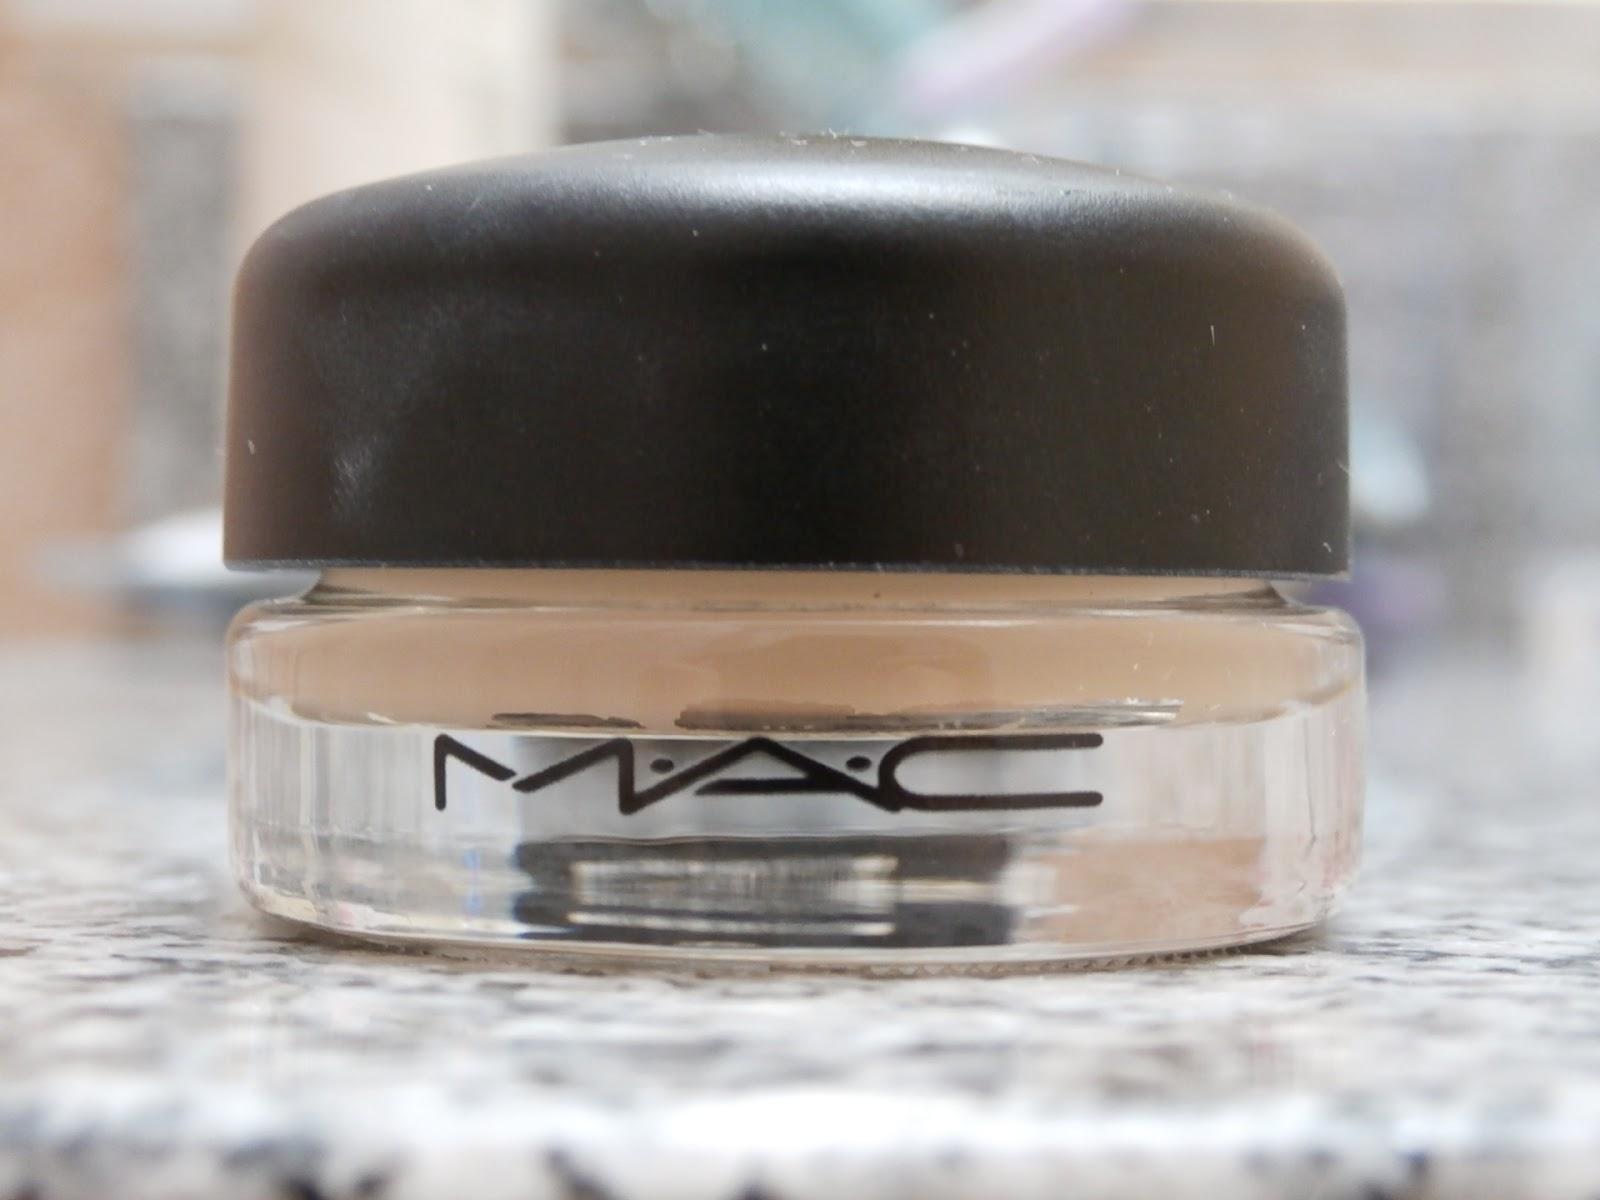 Mac Paint Pot Soft Ochre Uses